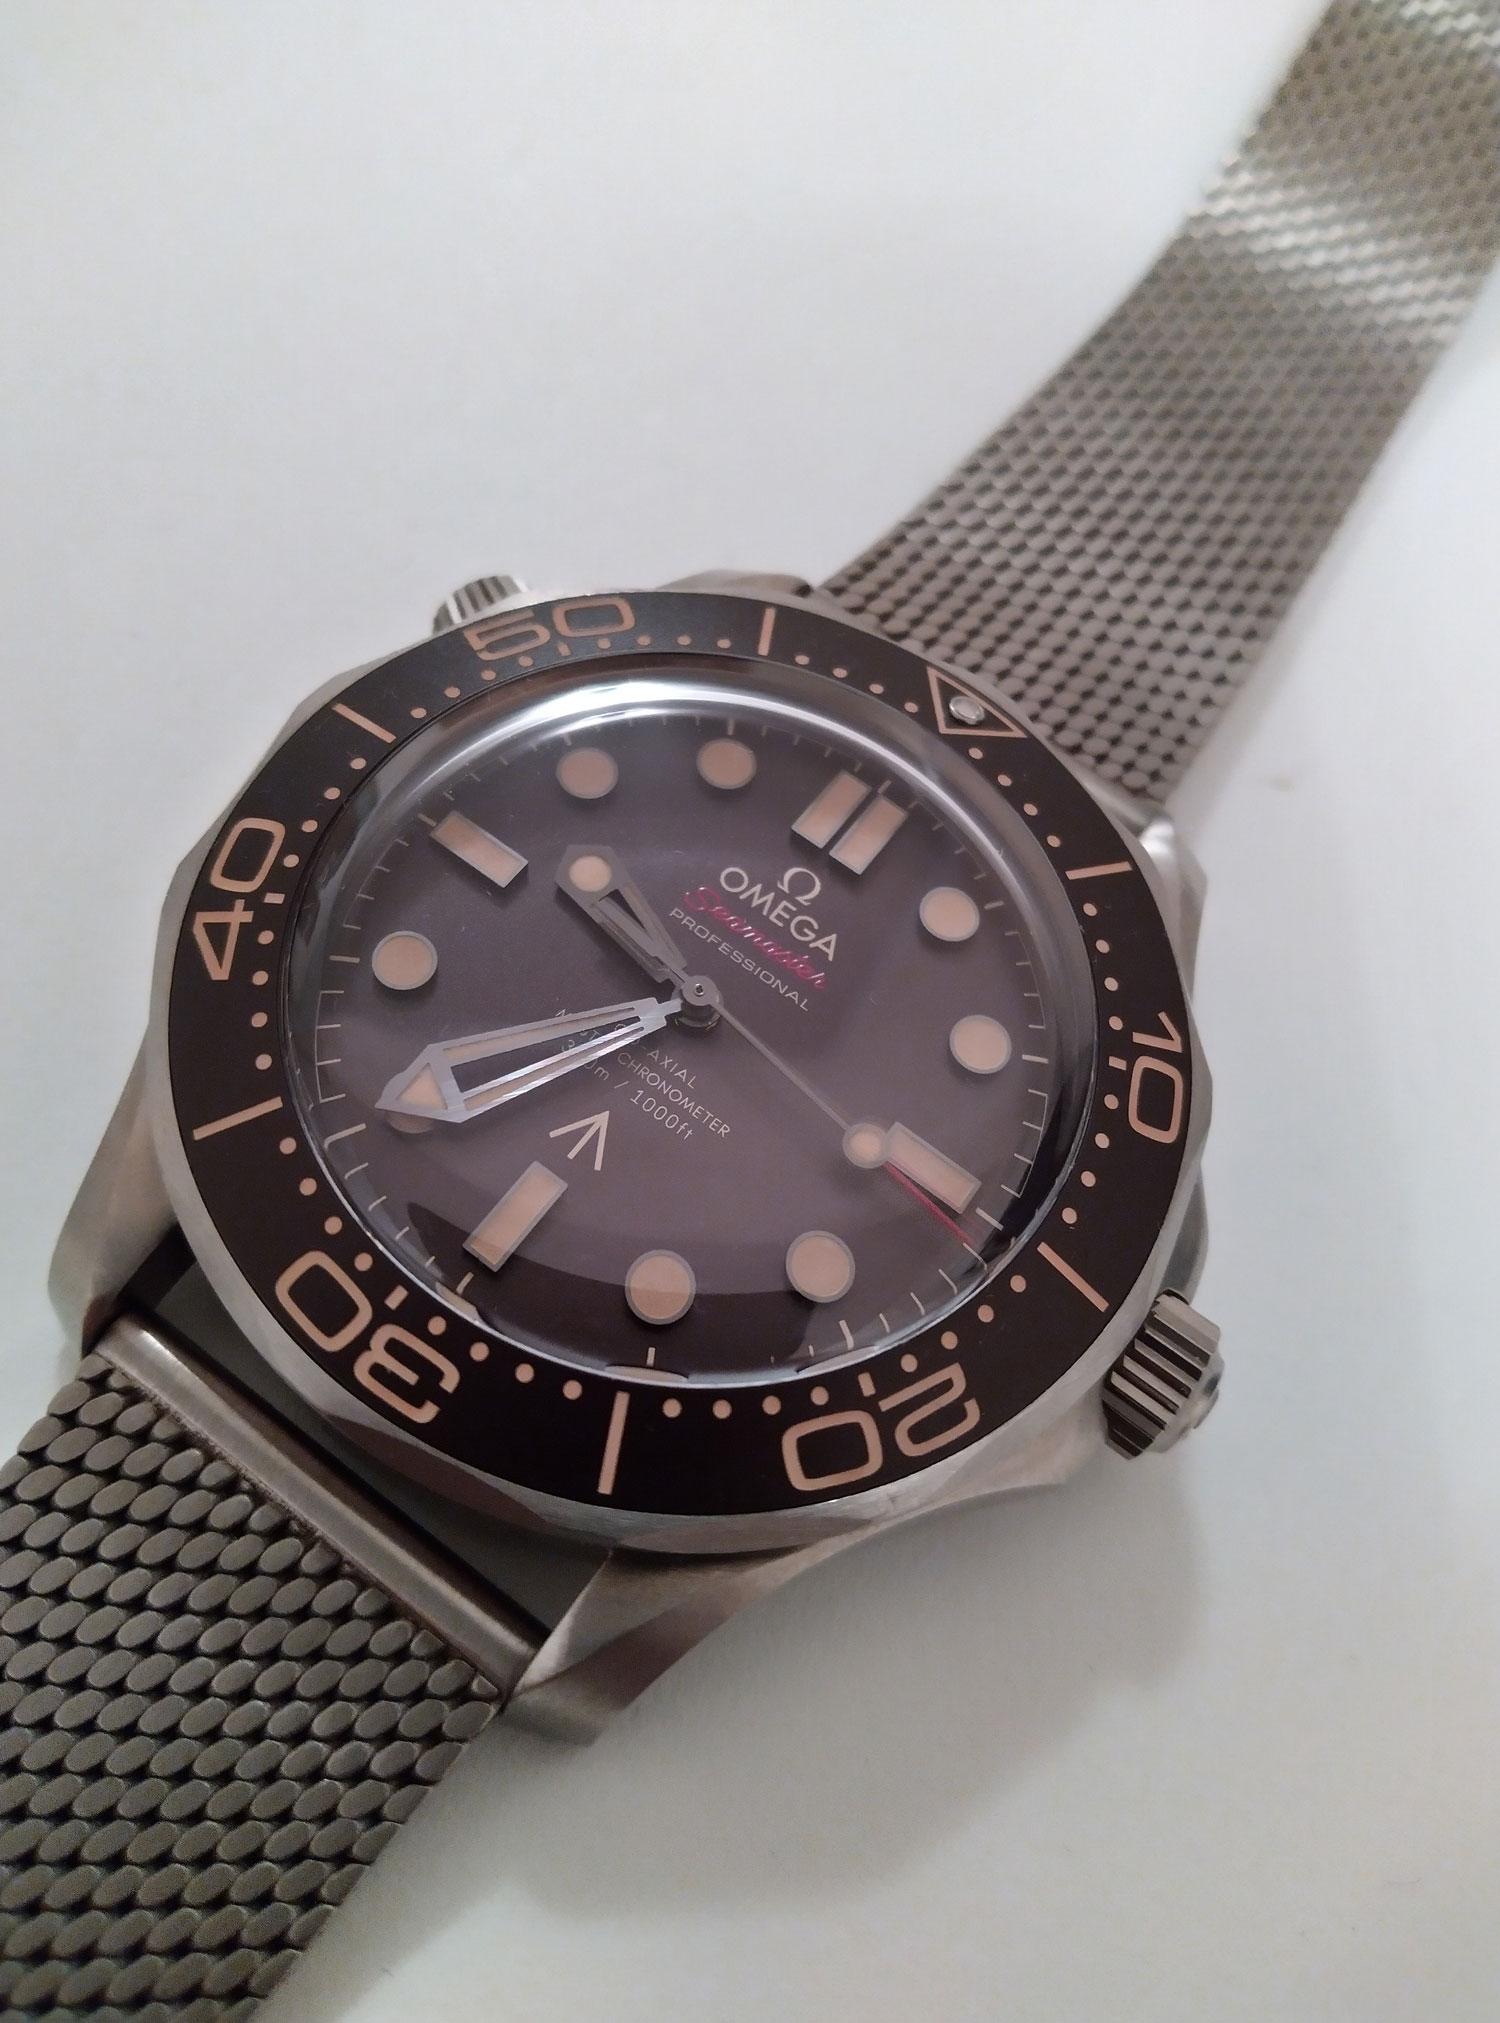 Omega Seamaster 300M dial